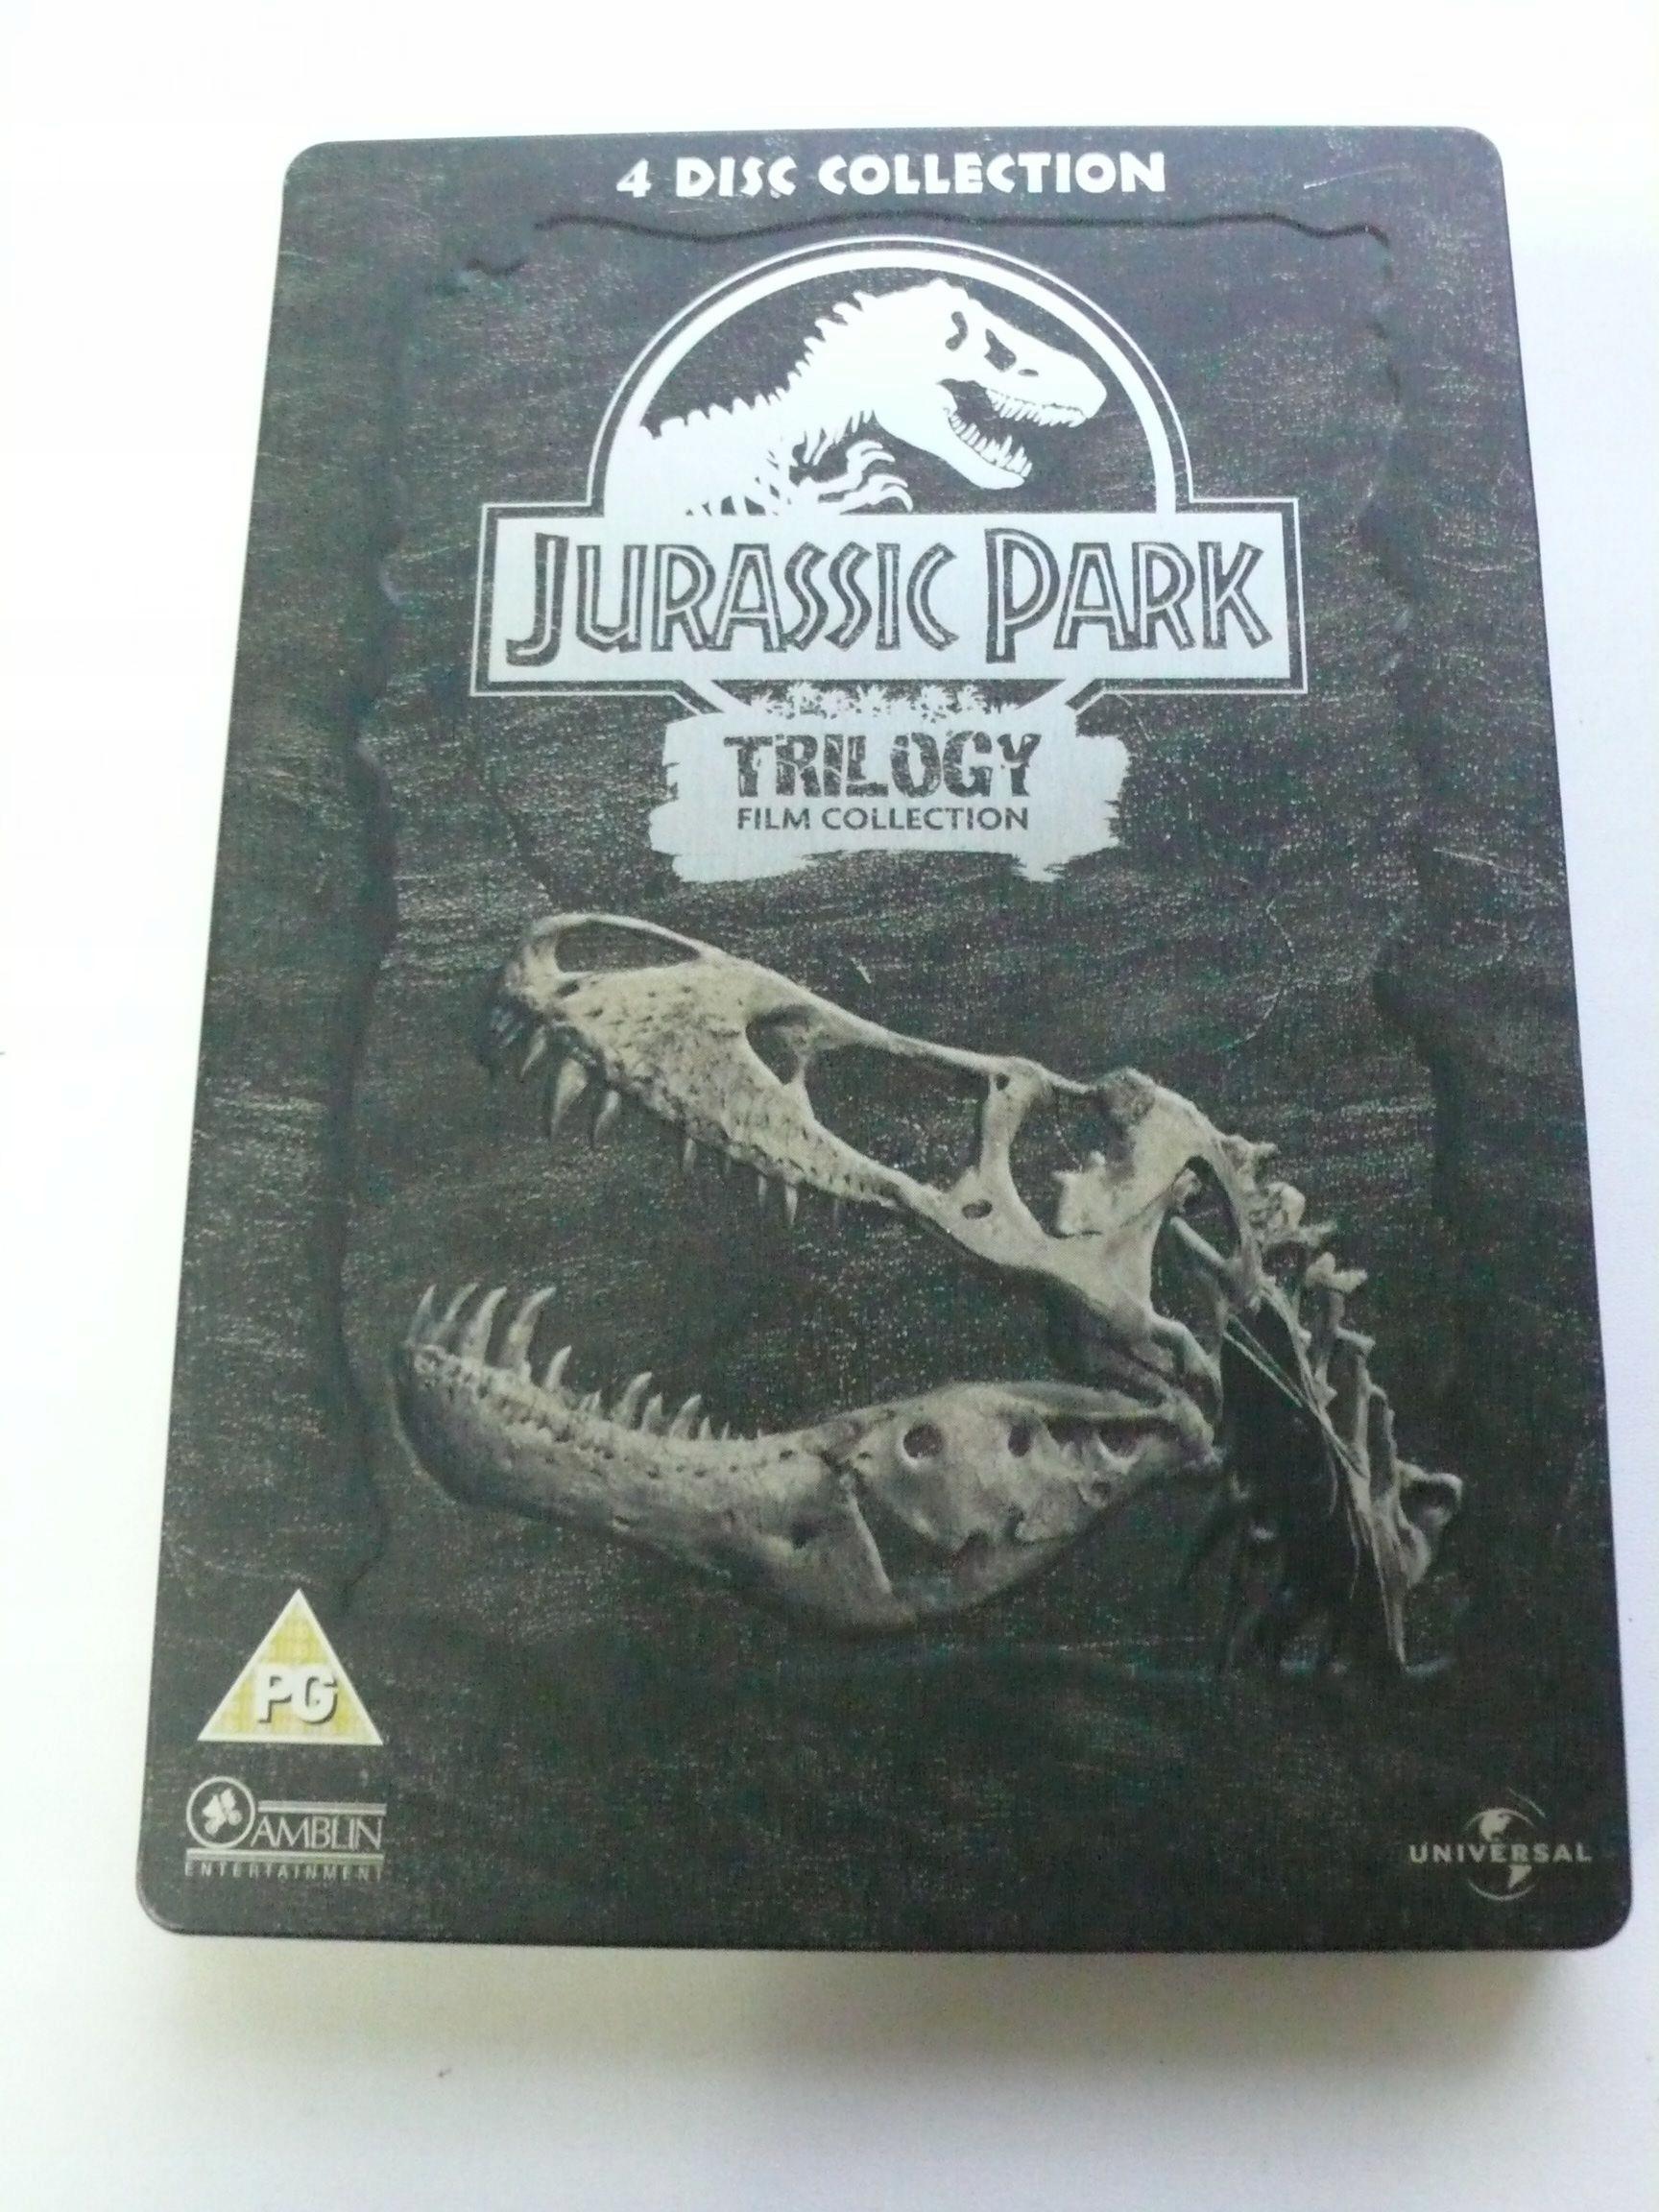 Jurassic park Trilogy 4DVD metal box S. Edition